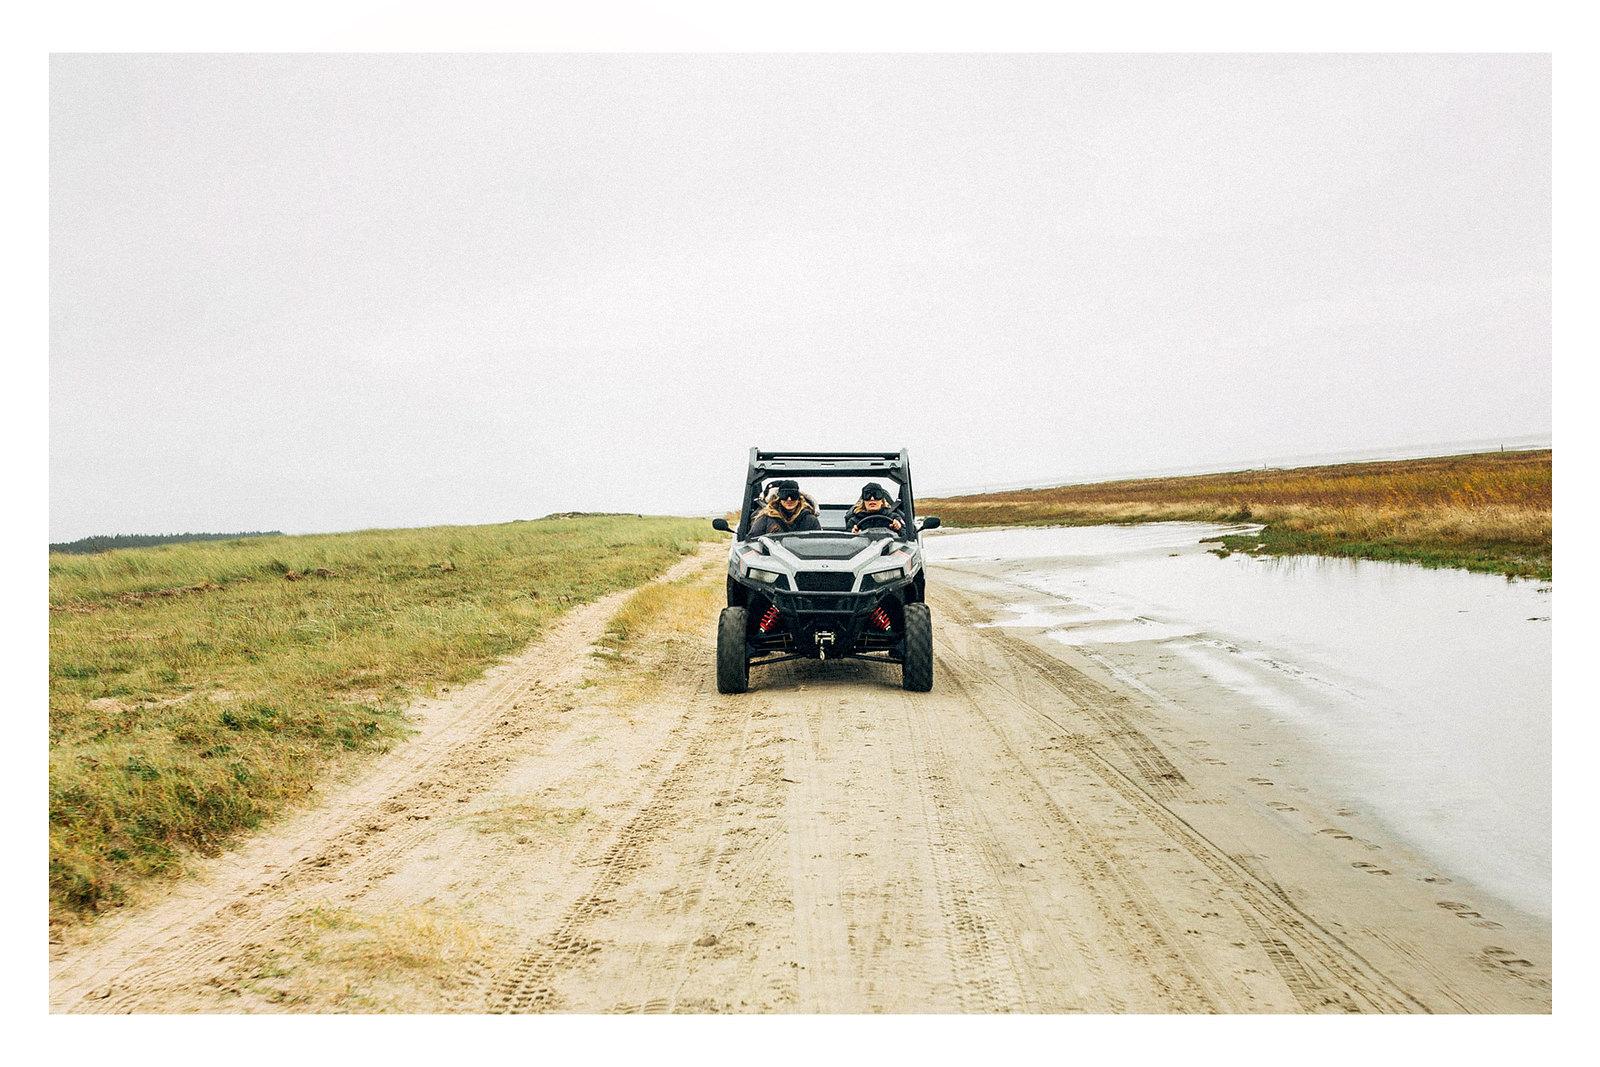 canada goose sylt beach buggy tour denmark travelblogger travelblog travellers coupleblog reiseblogger modeblog pressetrip pressereise cats & dogs style blogger ricarda schernus max bechmann fotografie film düsseldorf 9